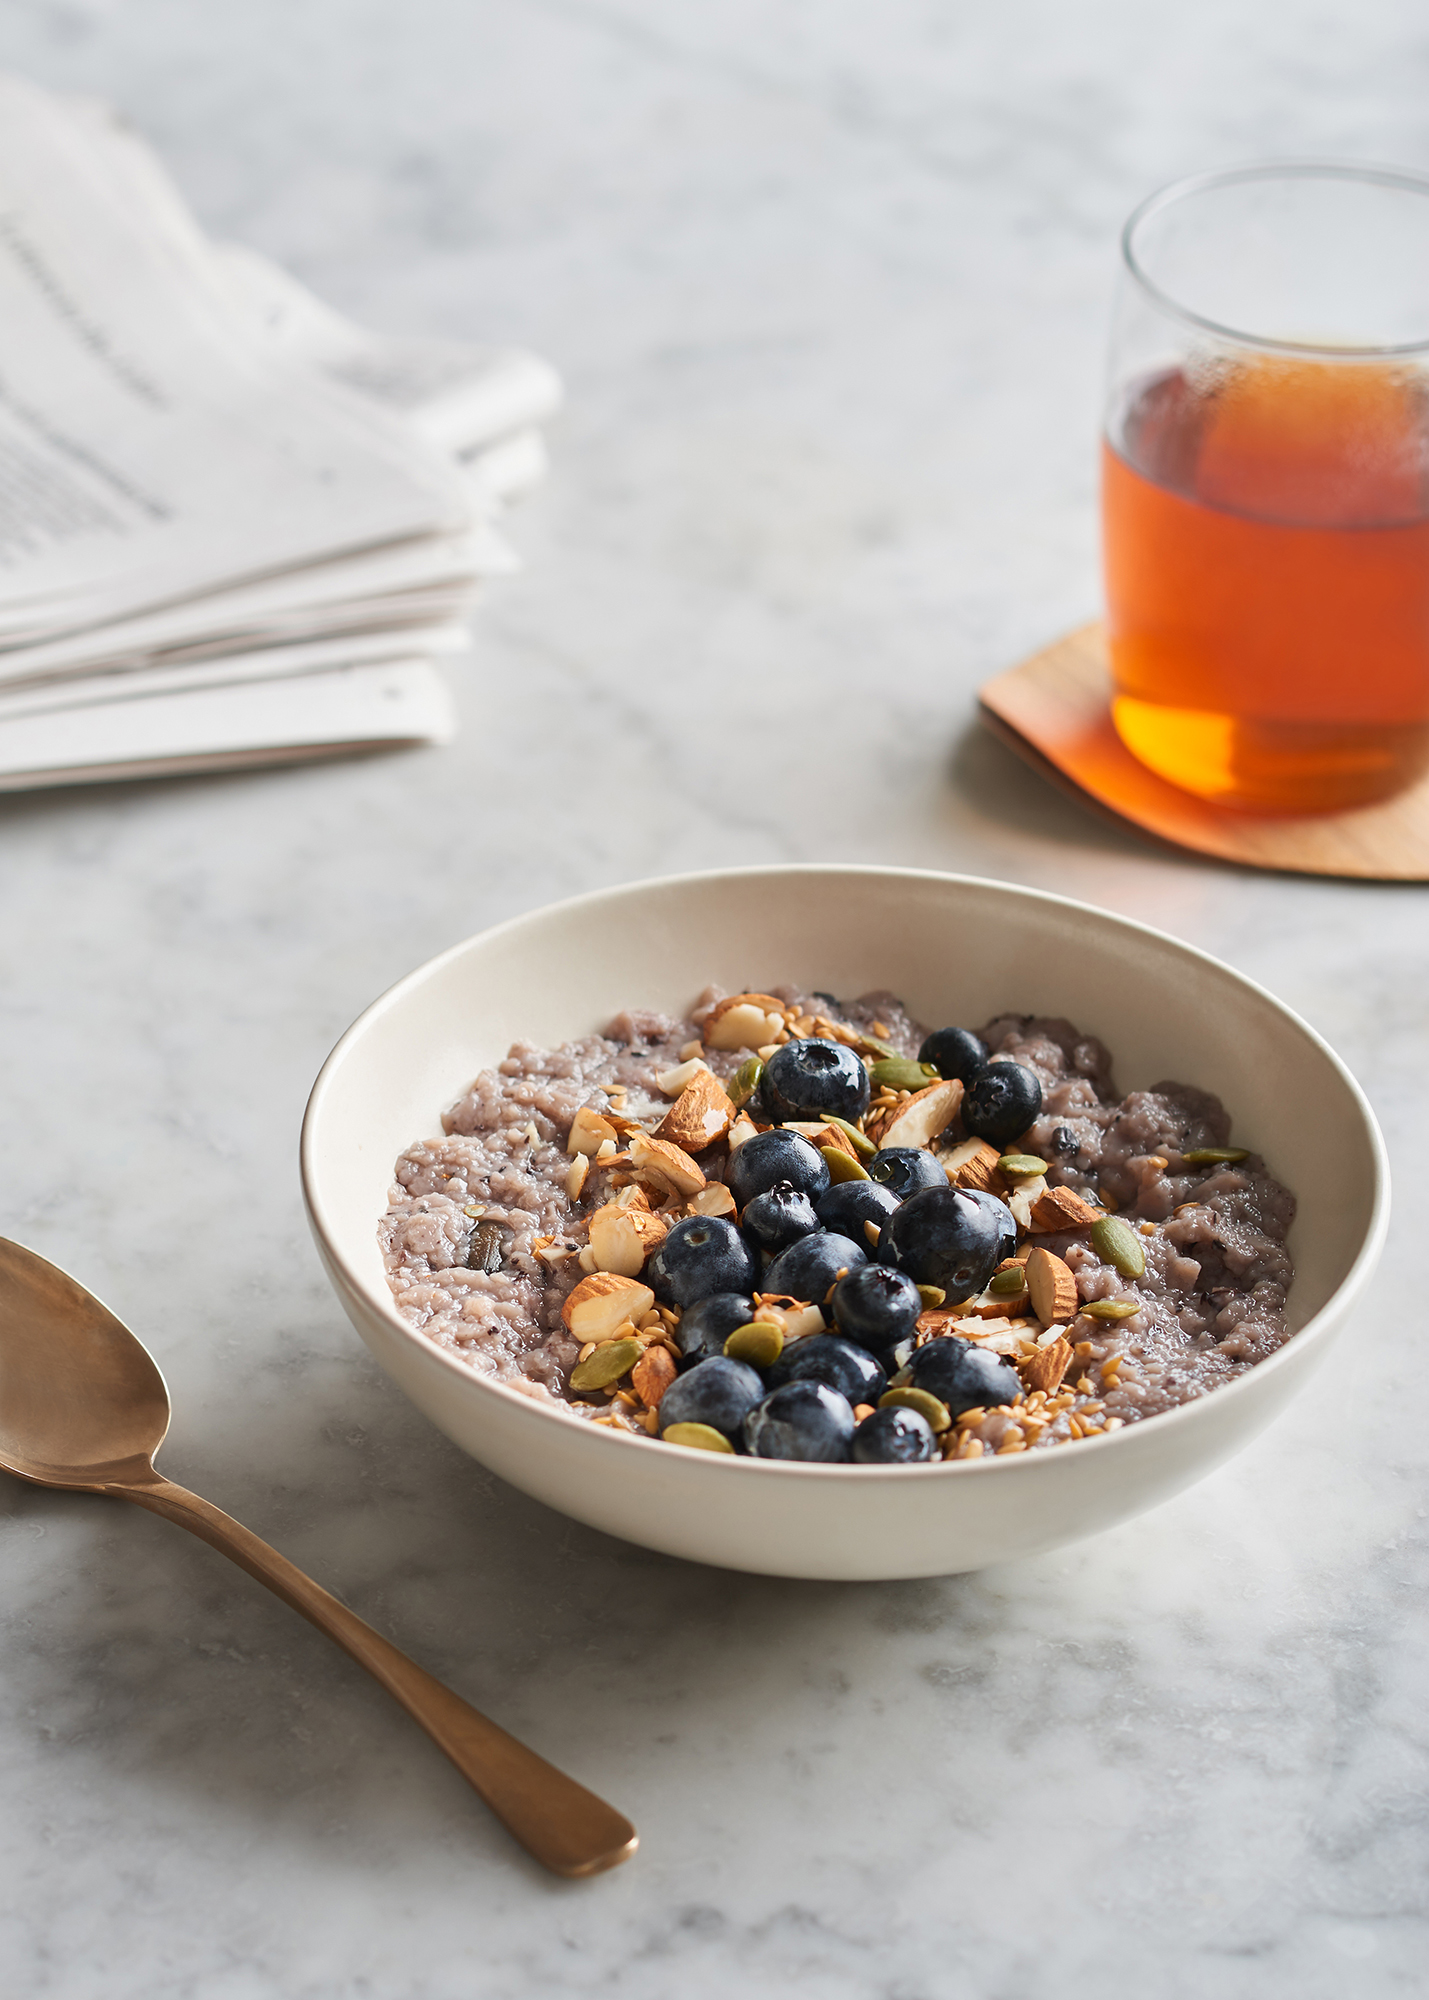 breakfast bowl with blueberries and porridge